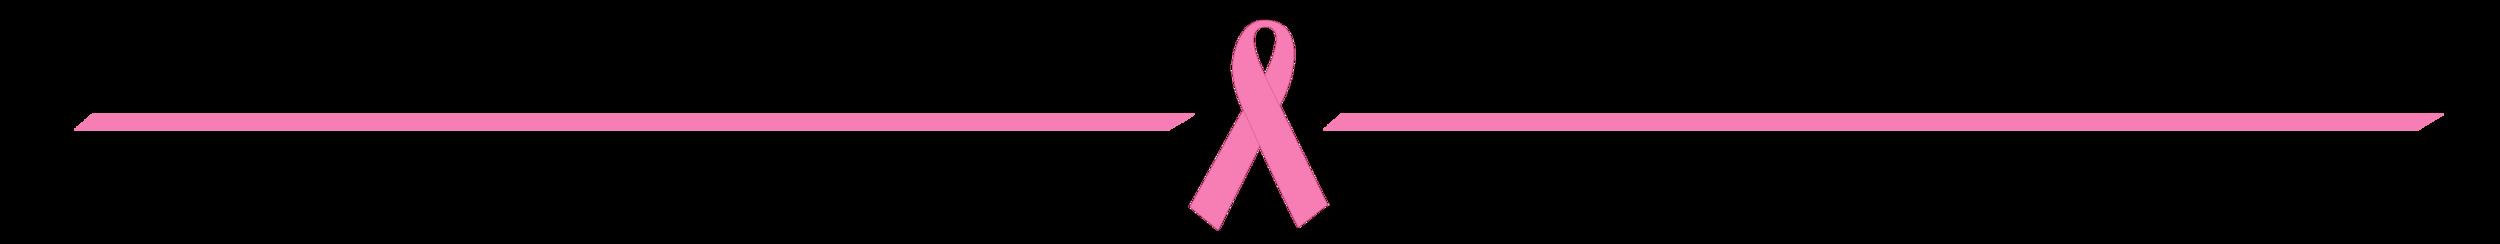 ribbon_separator2.png